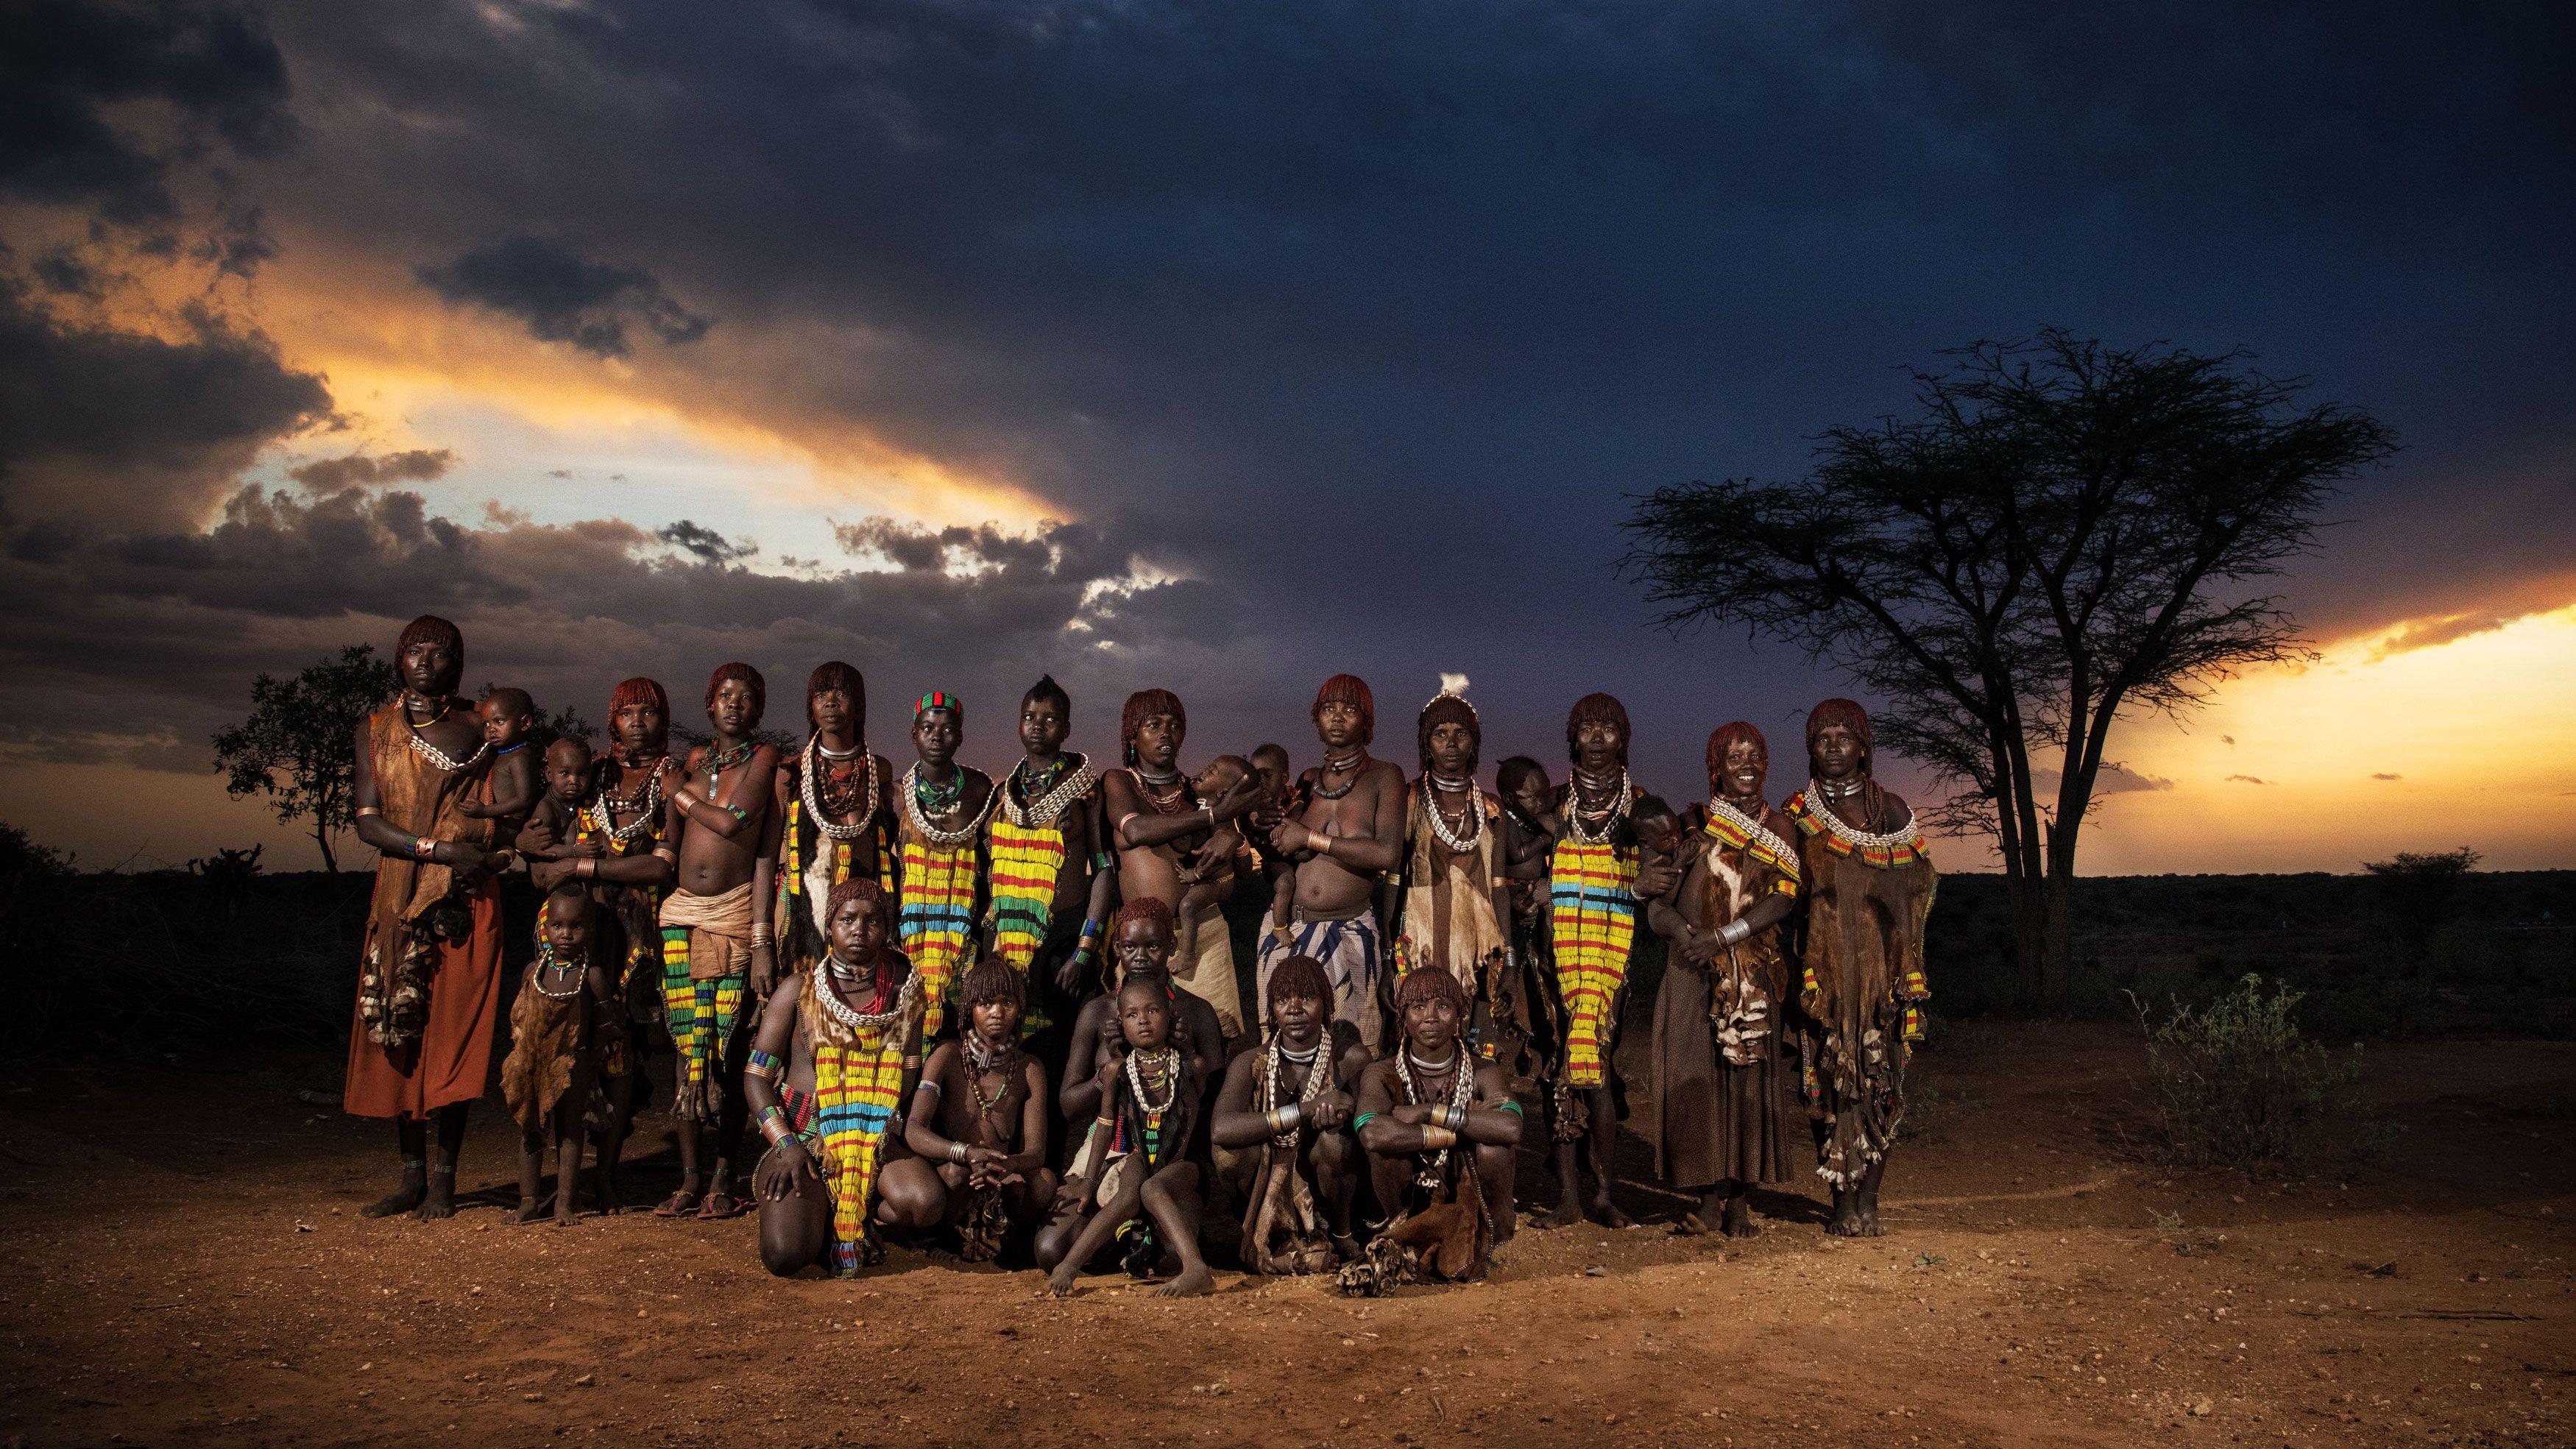 хамер, эфиопия, африка, Алексей Сулоев